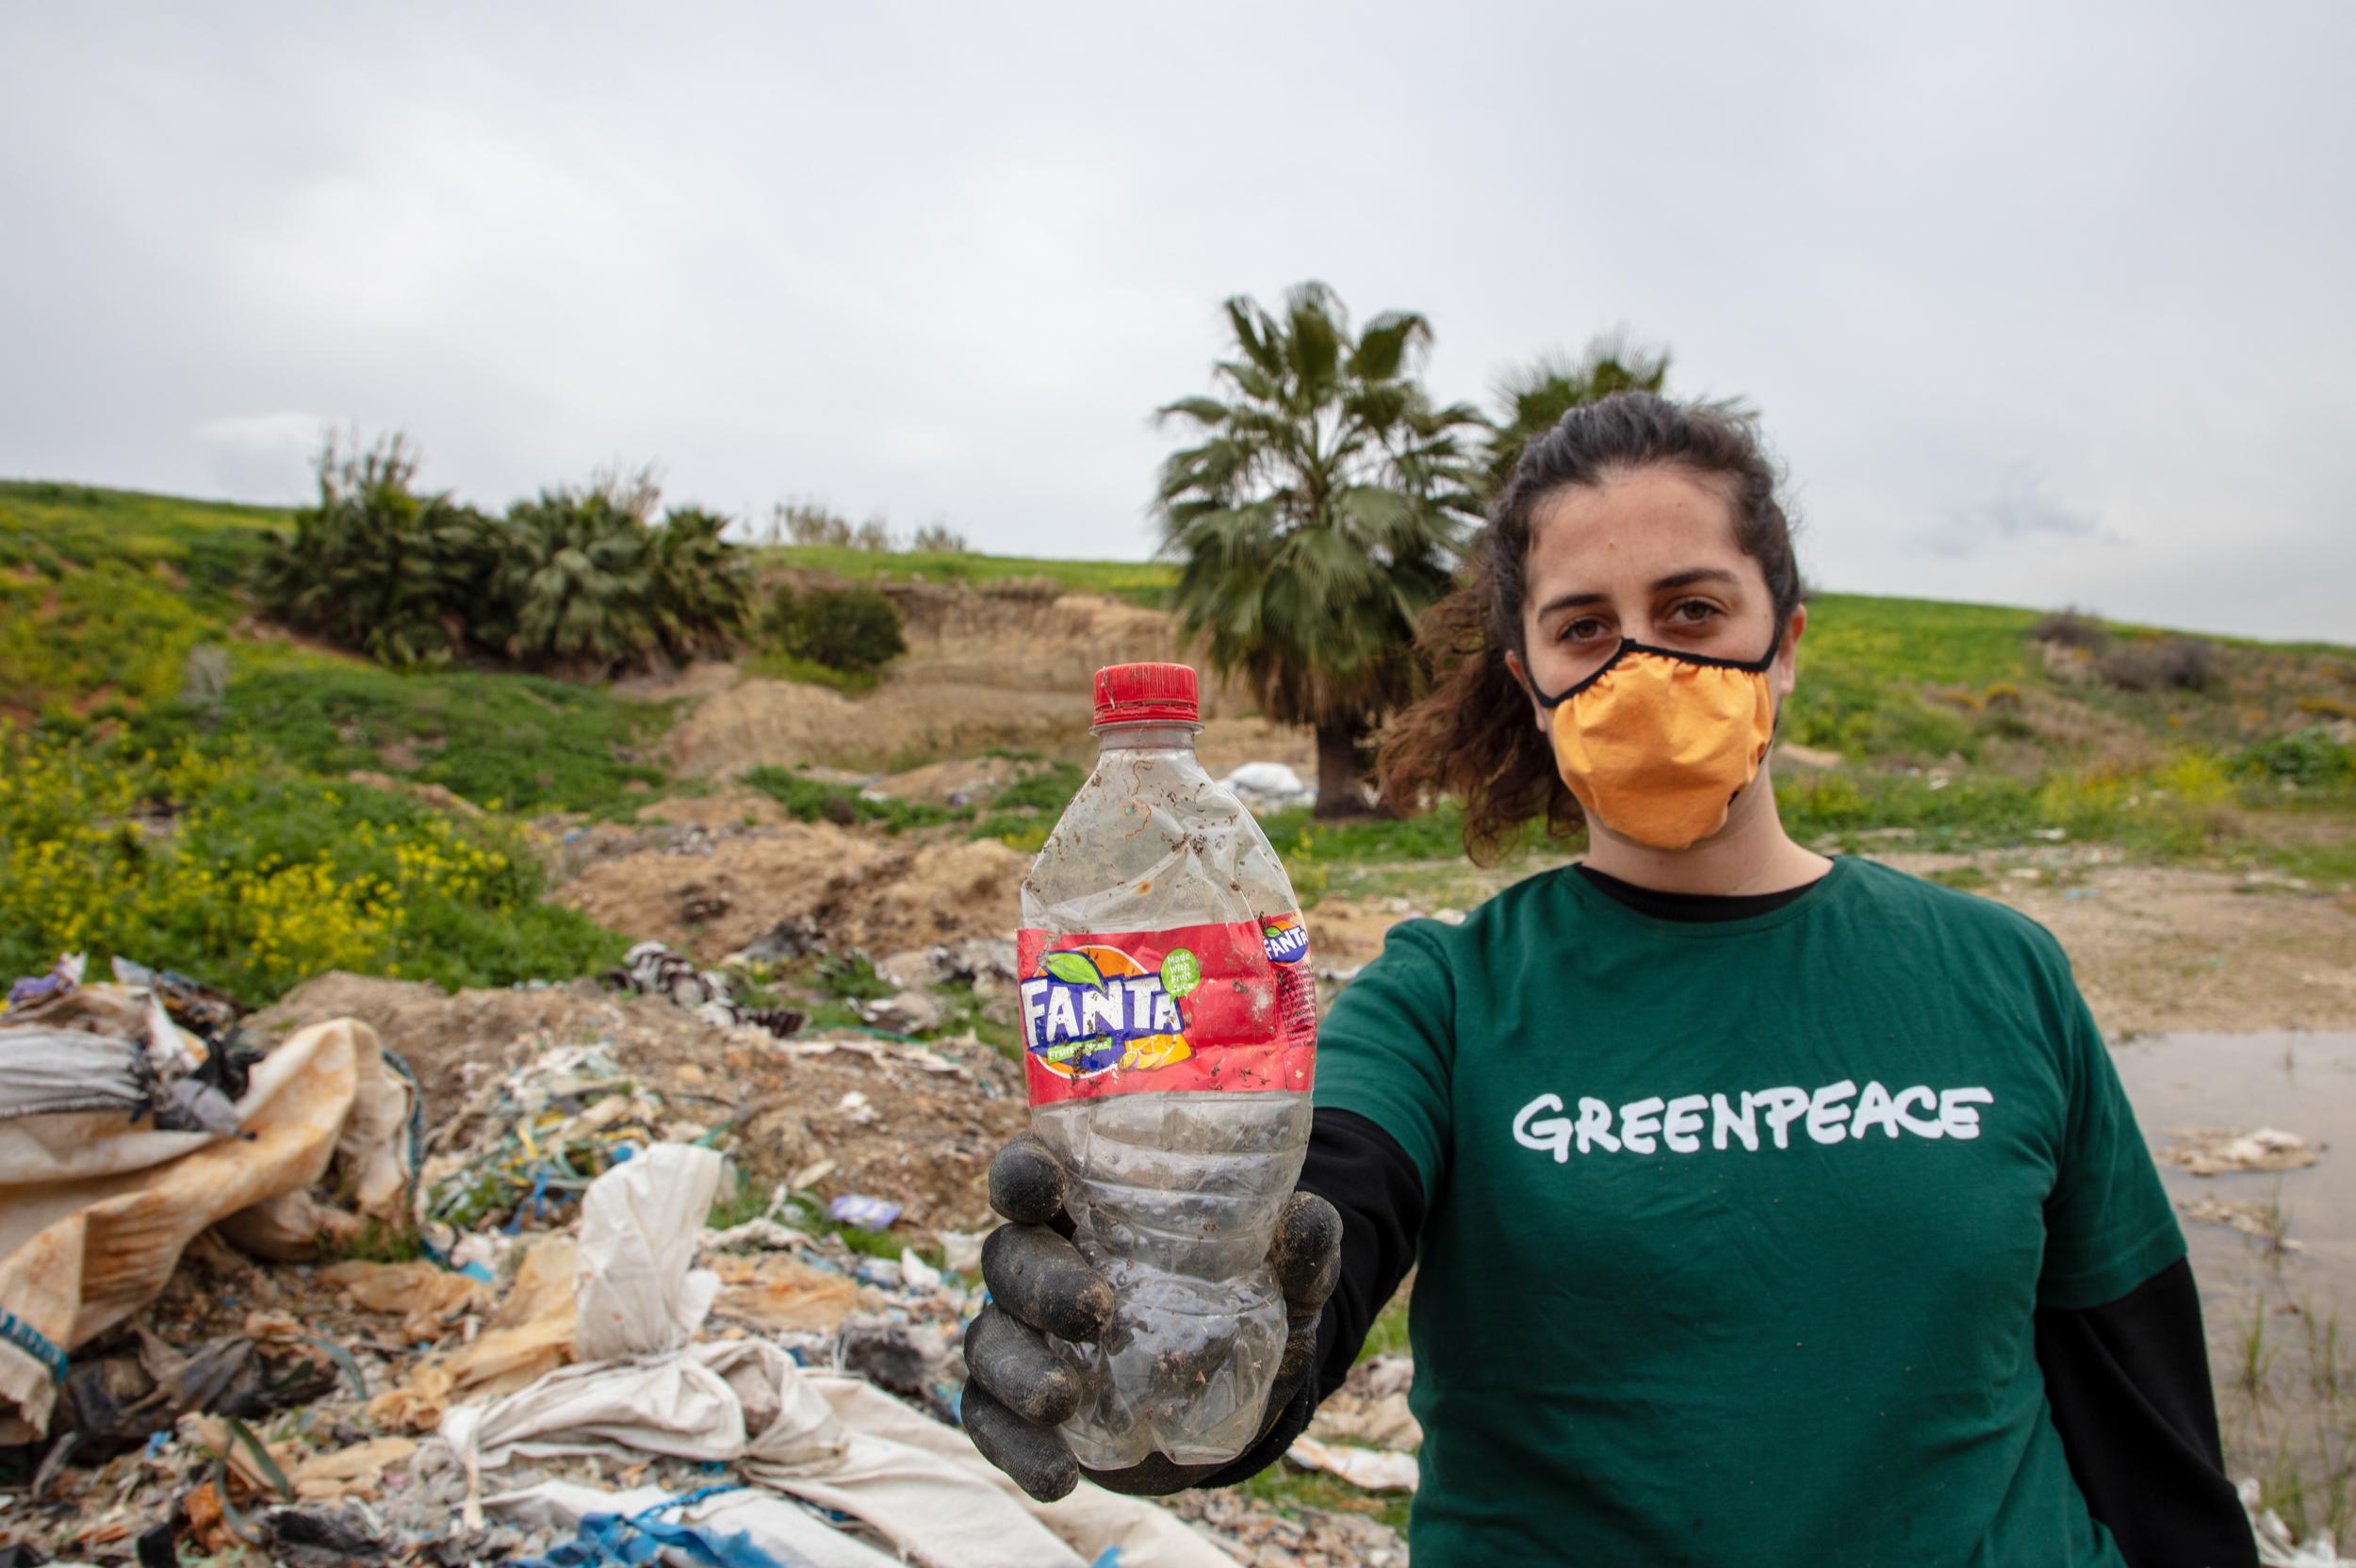 © Caner Ozkan / Greenpeace